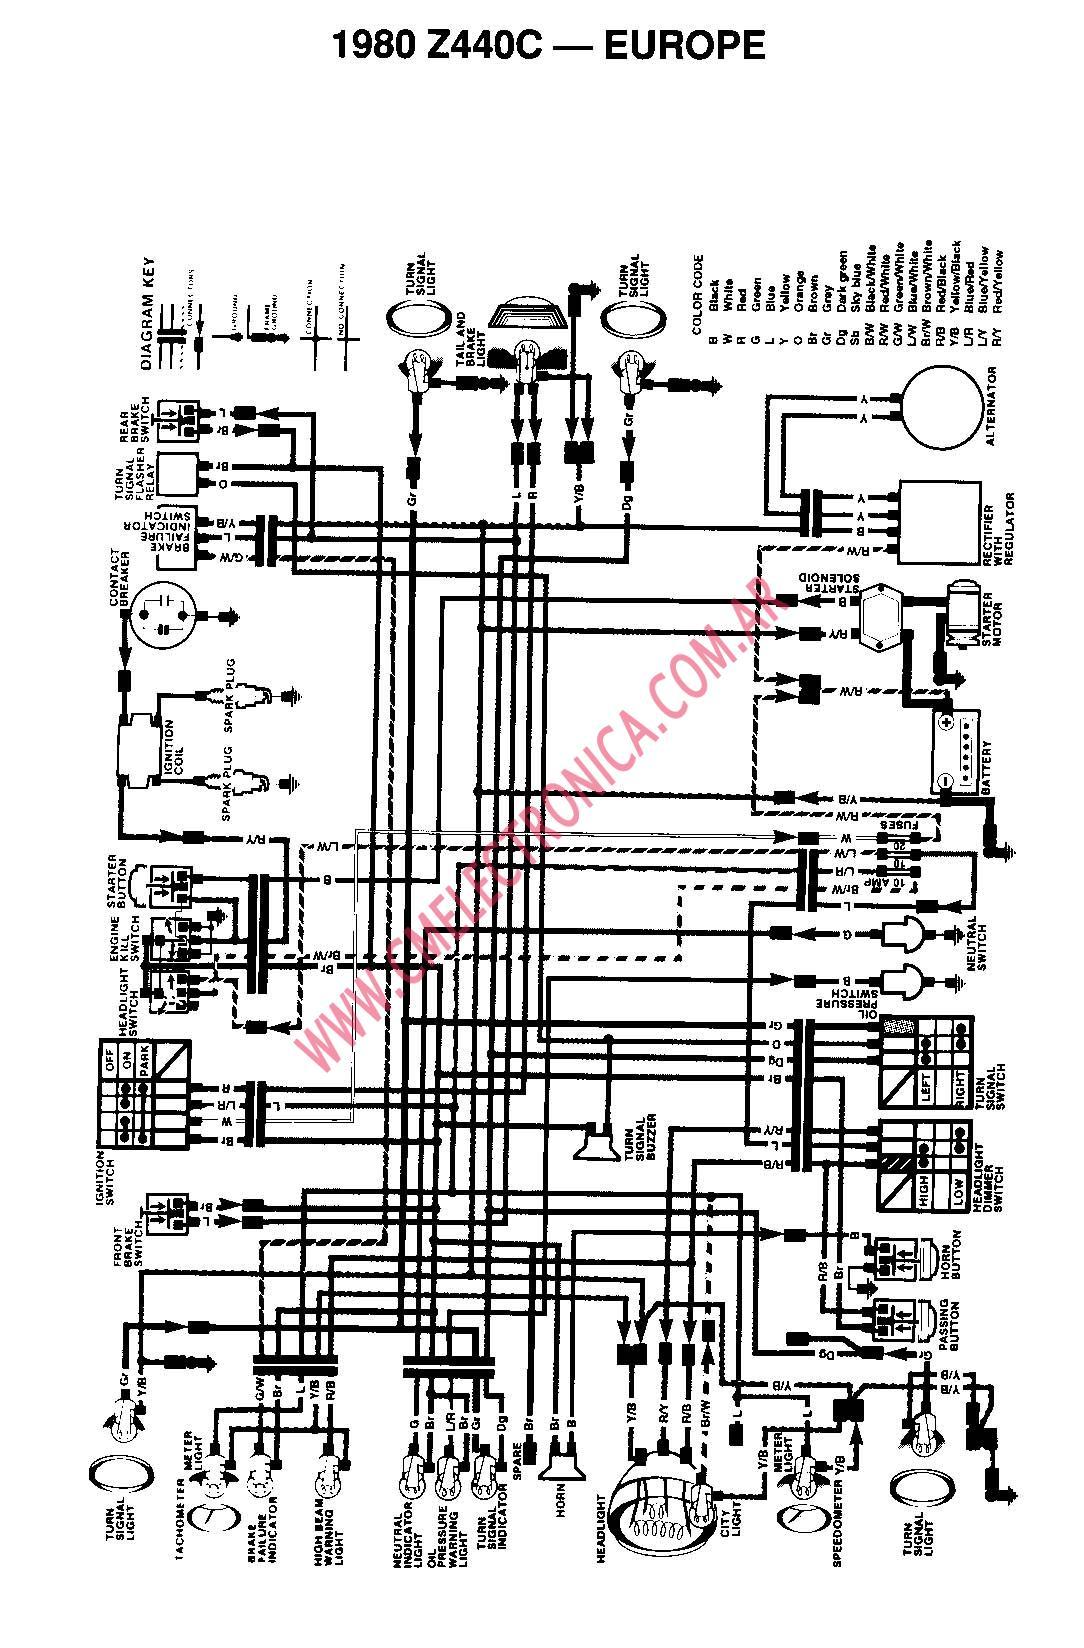 kawasaki bayou 300 4x4 wiring diagram - wiring diagram schematic pen-store  - pen-store.aliceviola.it  aliceviola.it